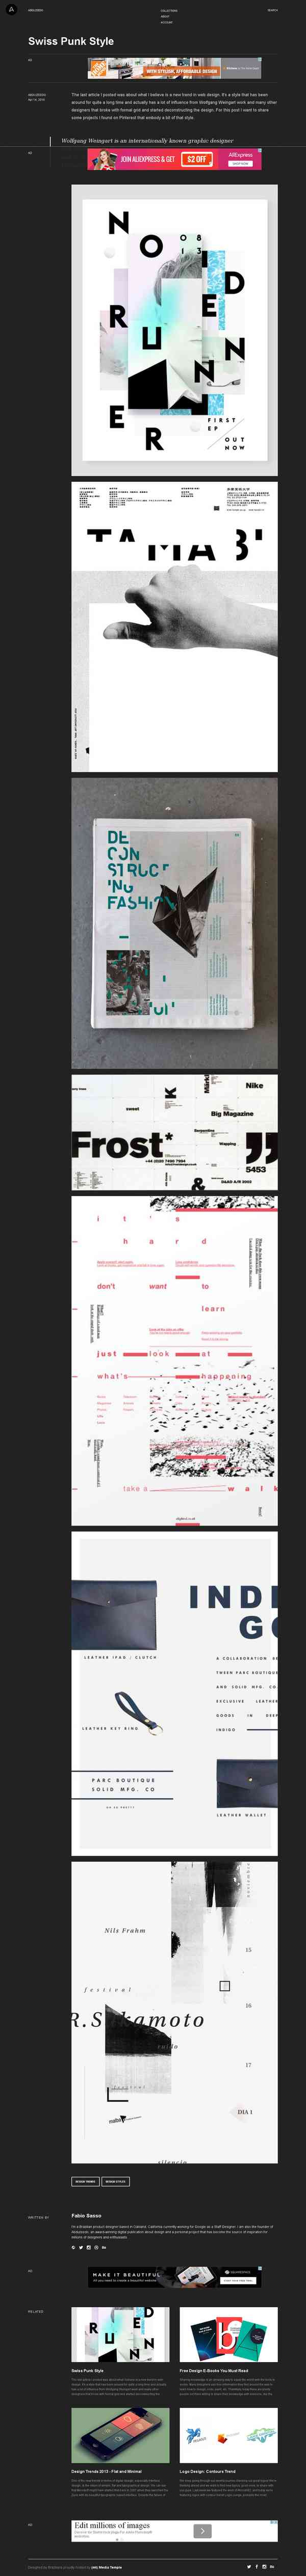 Swiss Punk Style | Abduzeedo Design Inspiration